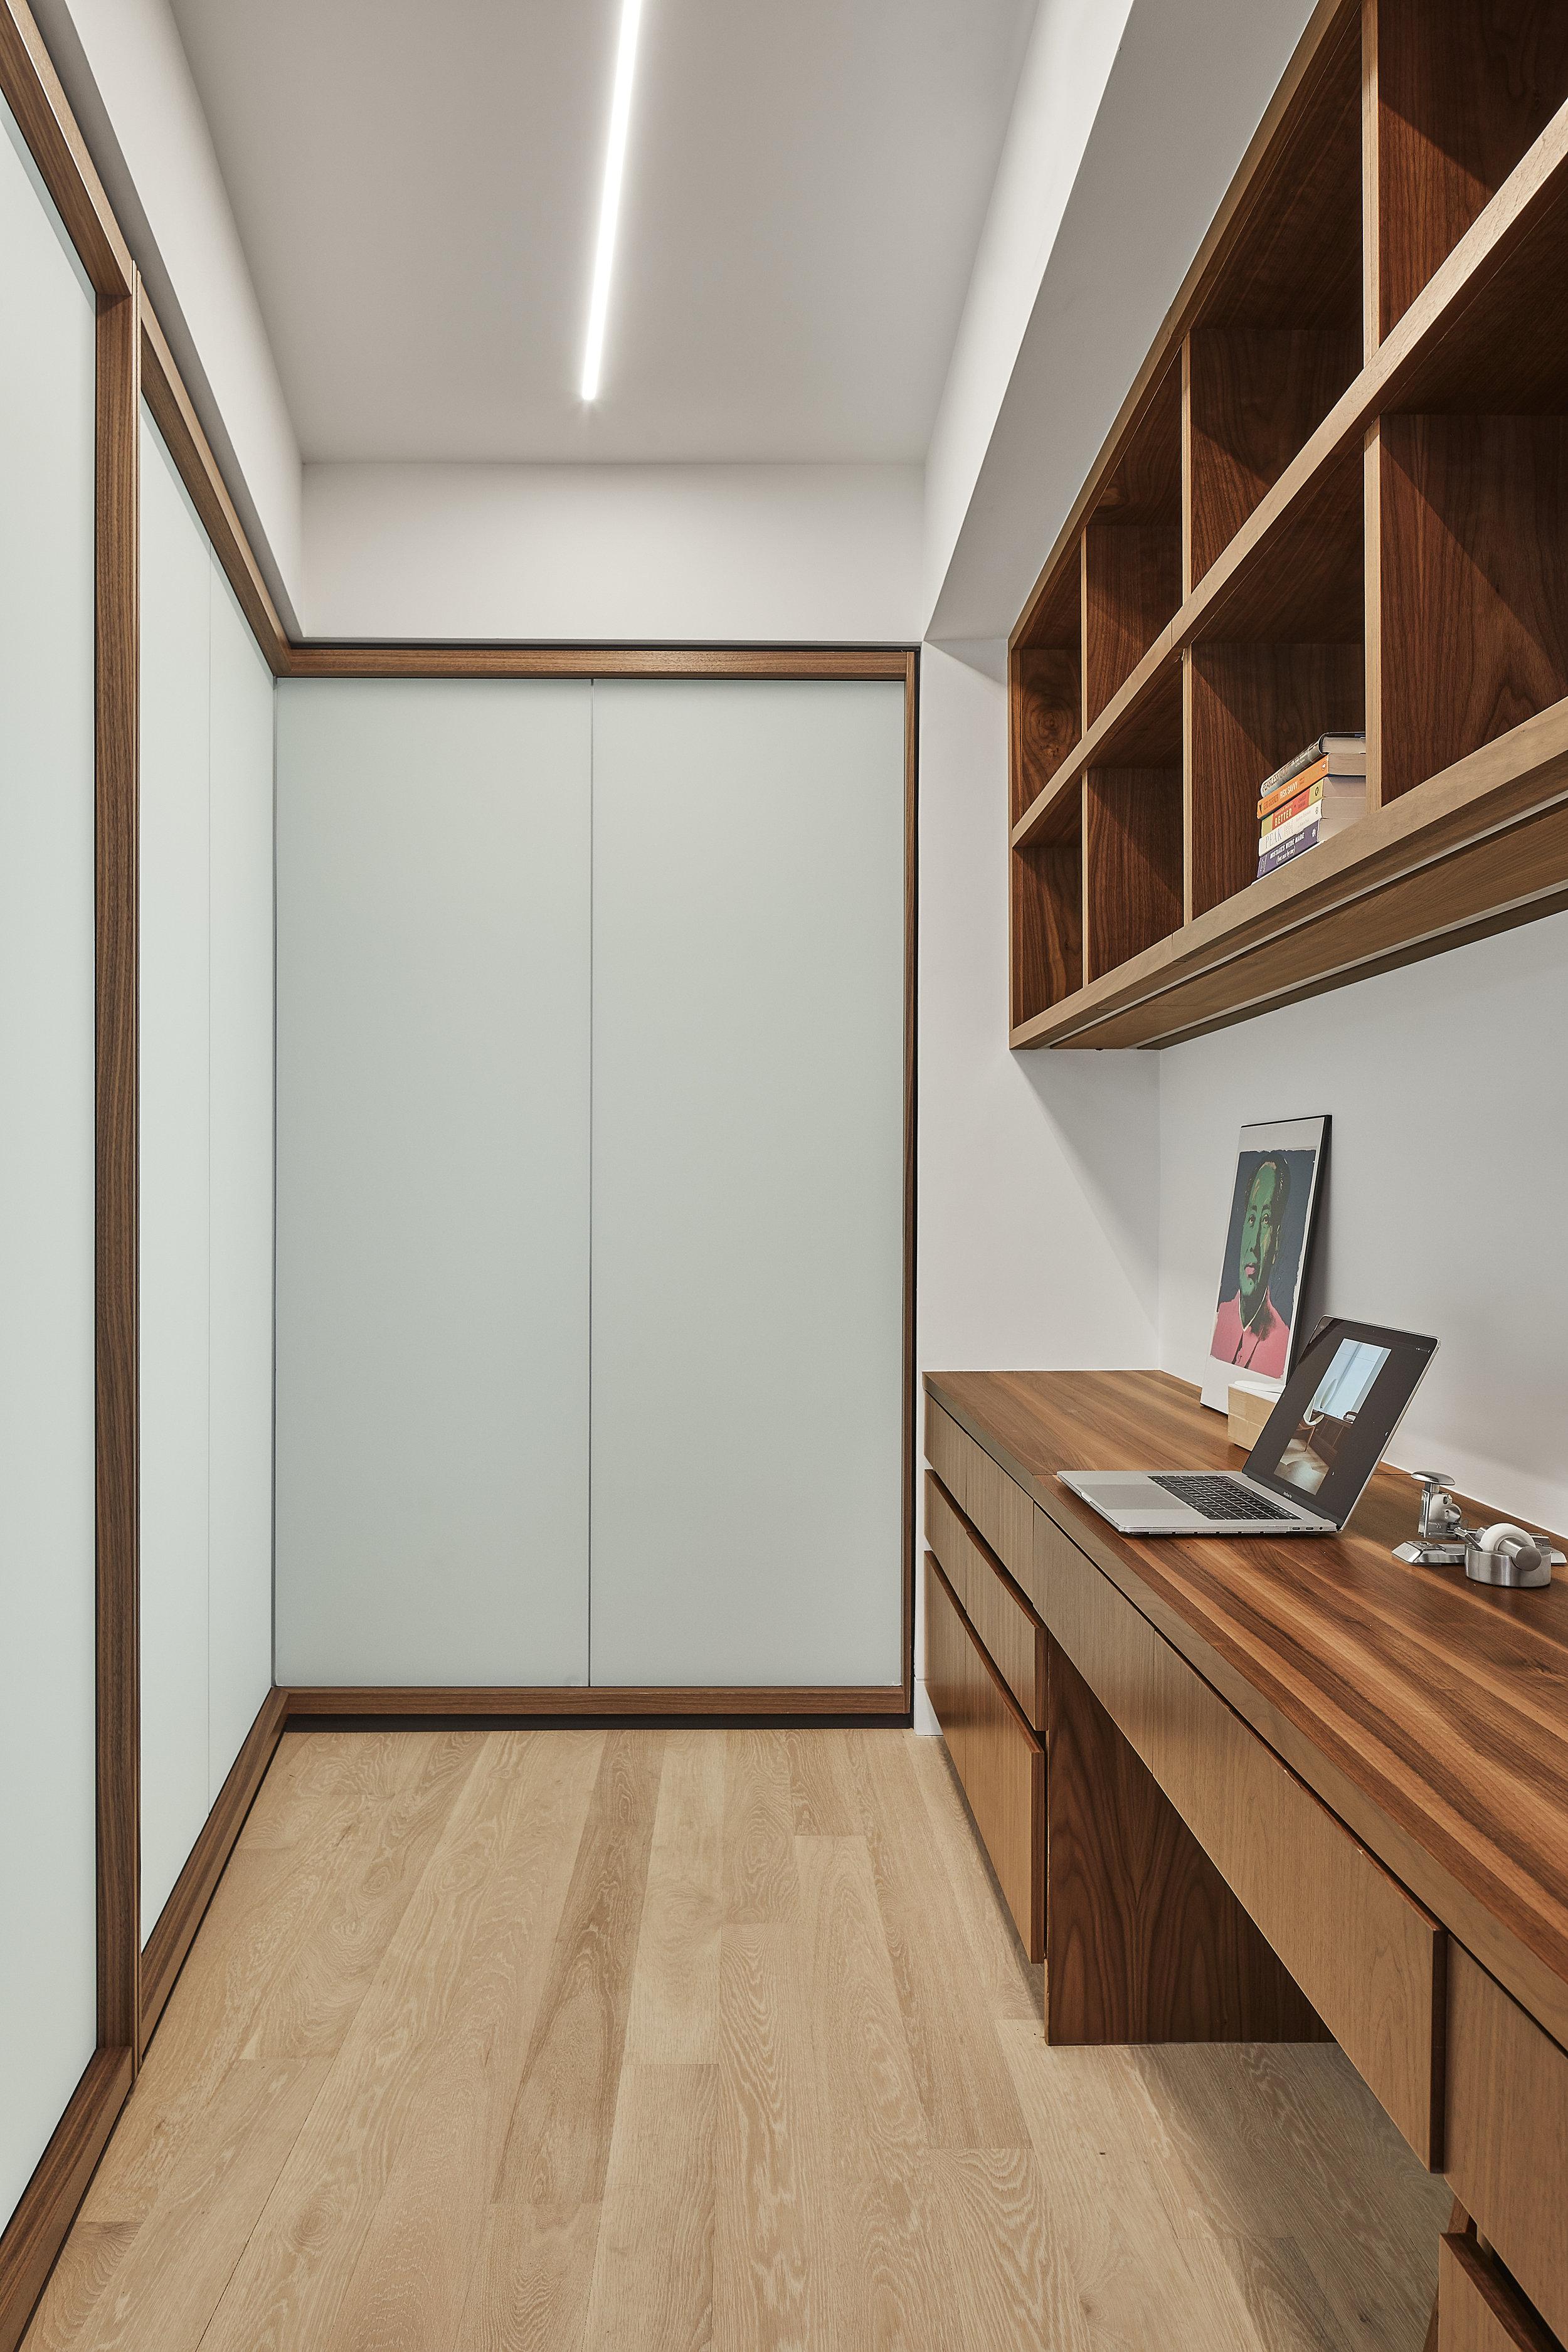 turkel_design_modern_prefab_home_soho_loft_office_cabinetry_storage.jpg